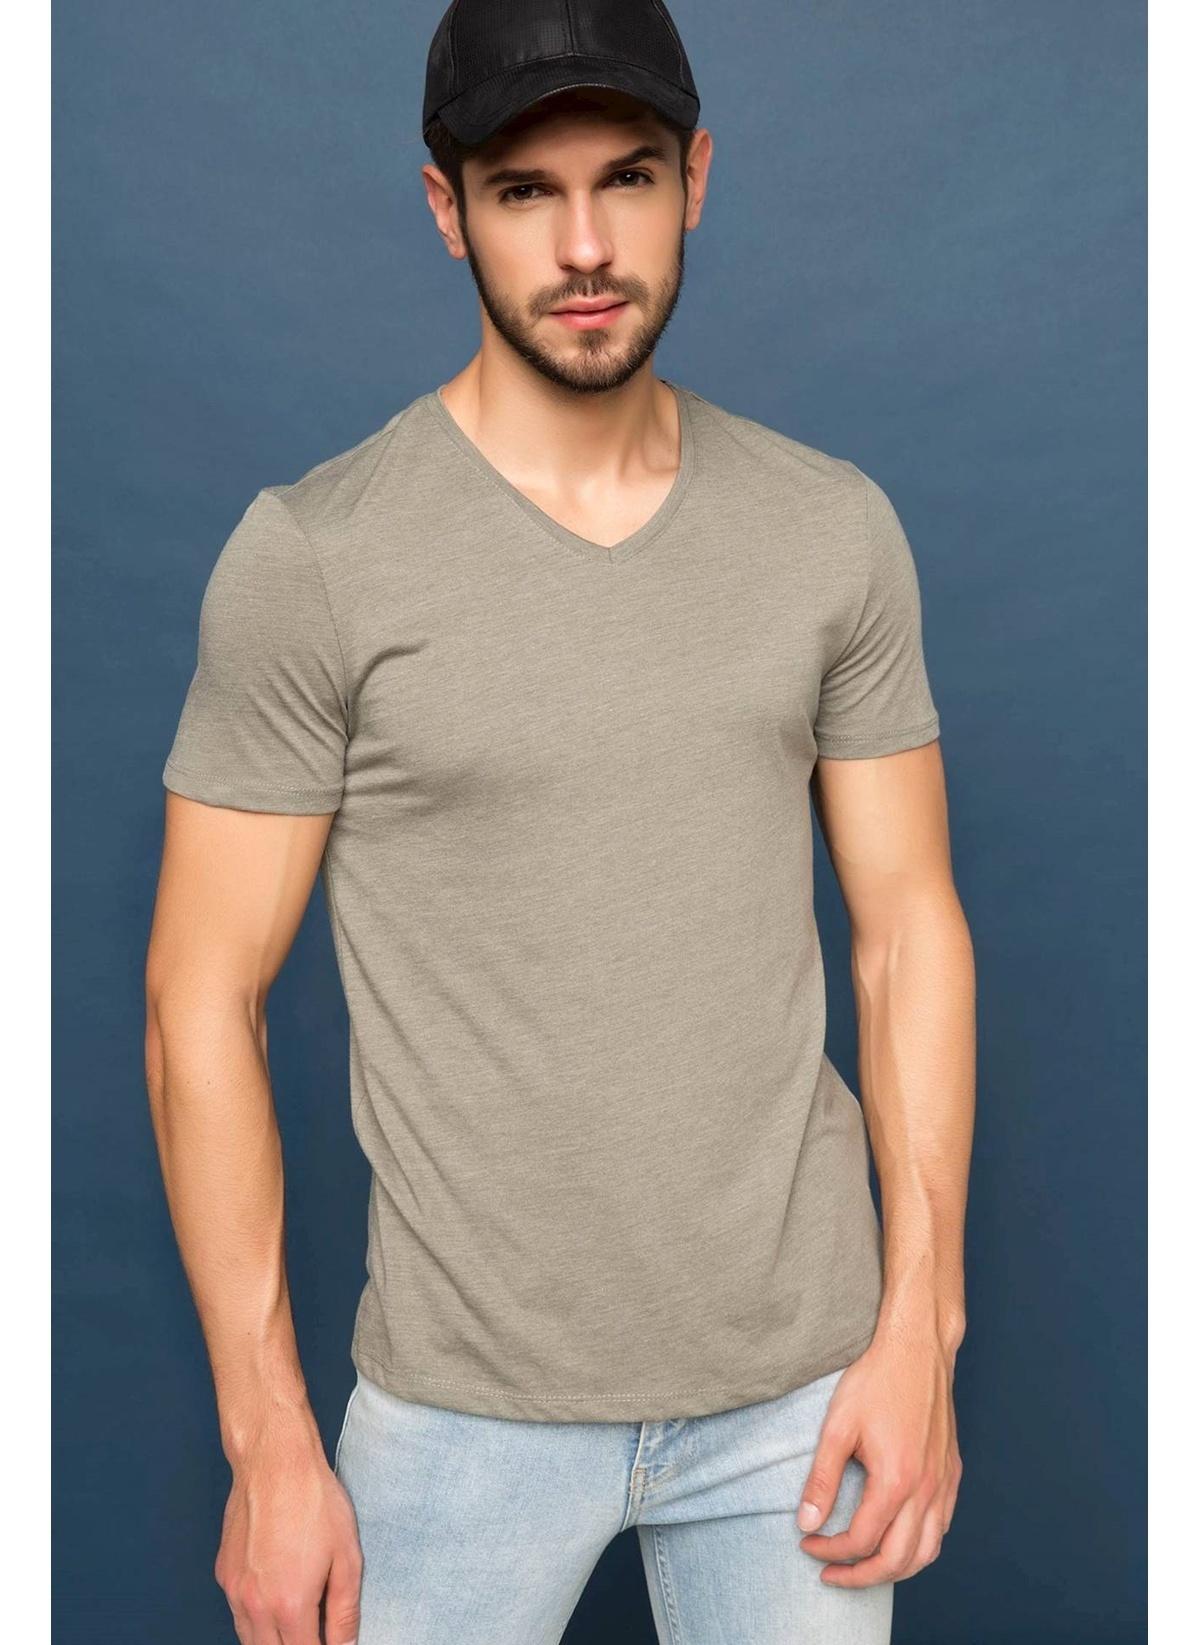 Defacto Basic V Yaka T-shirt G5734az17smkh174t-shirt – 24.99 TL